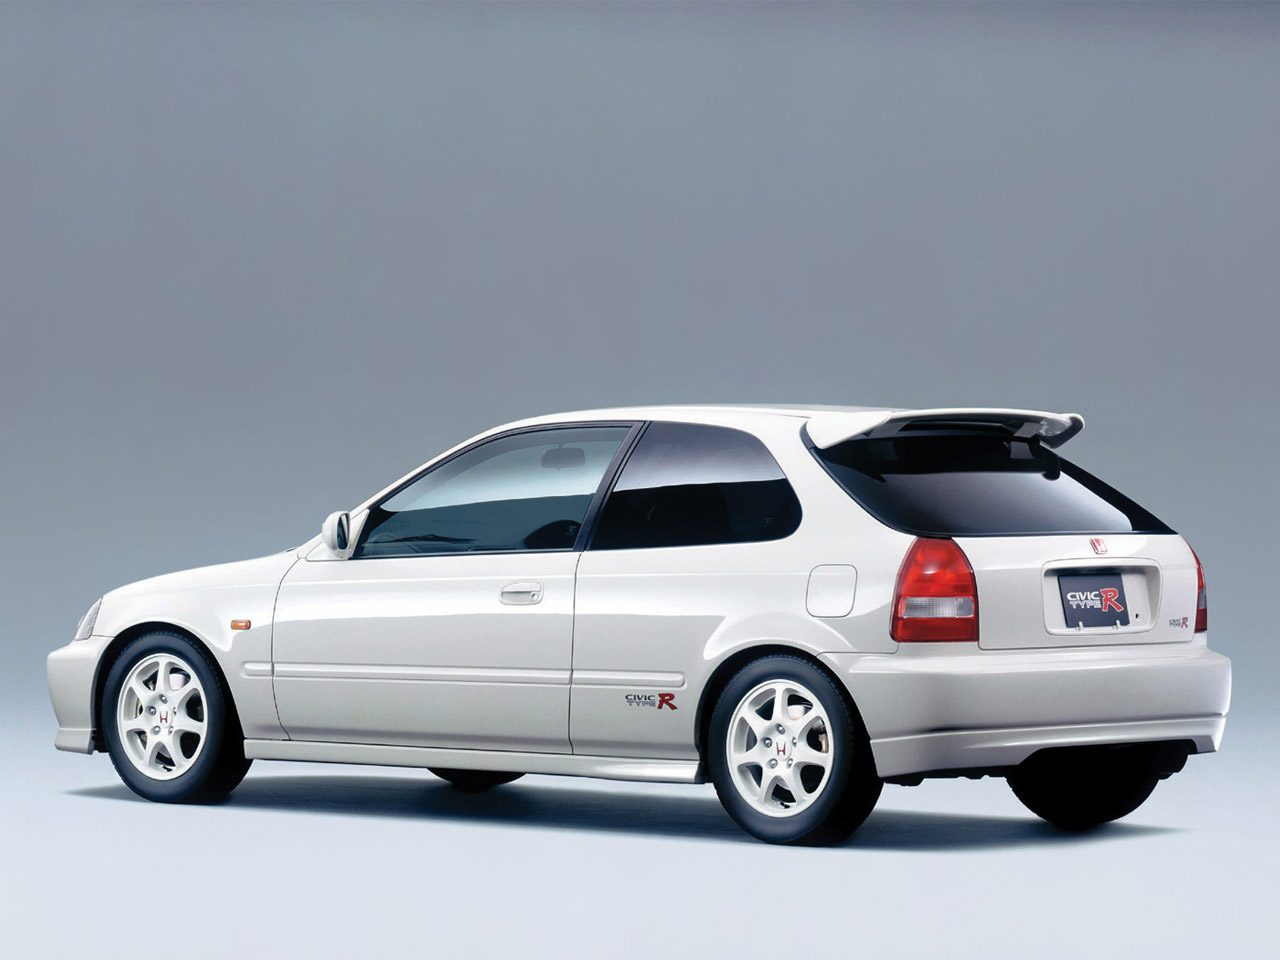 Done Gt Sport Honda Civic Ek Type R Premium 1998